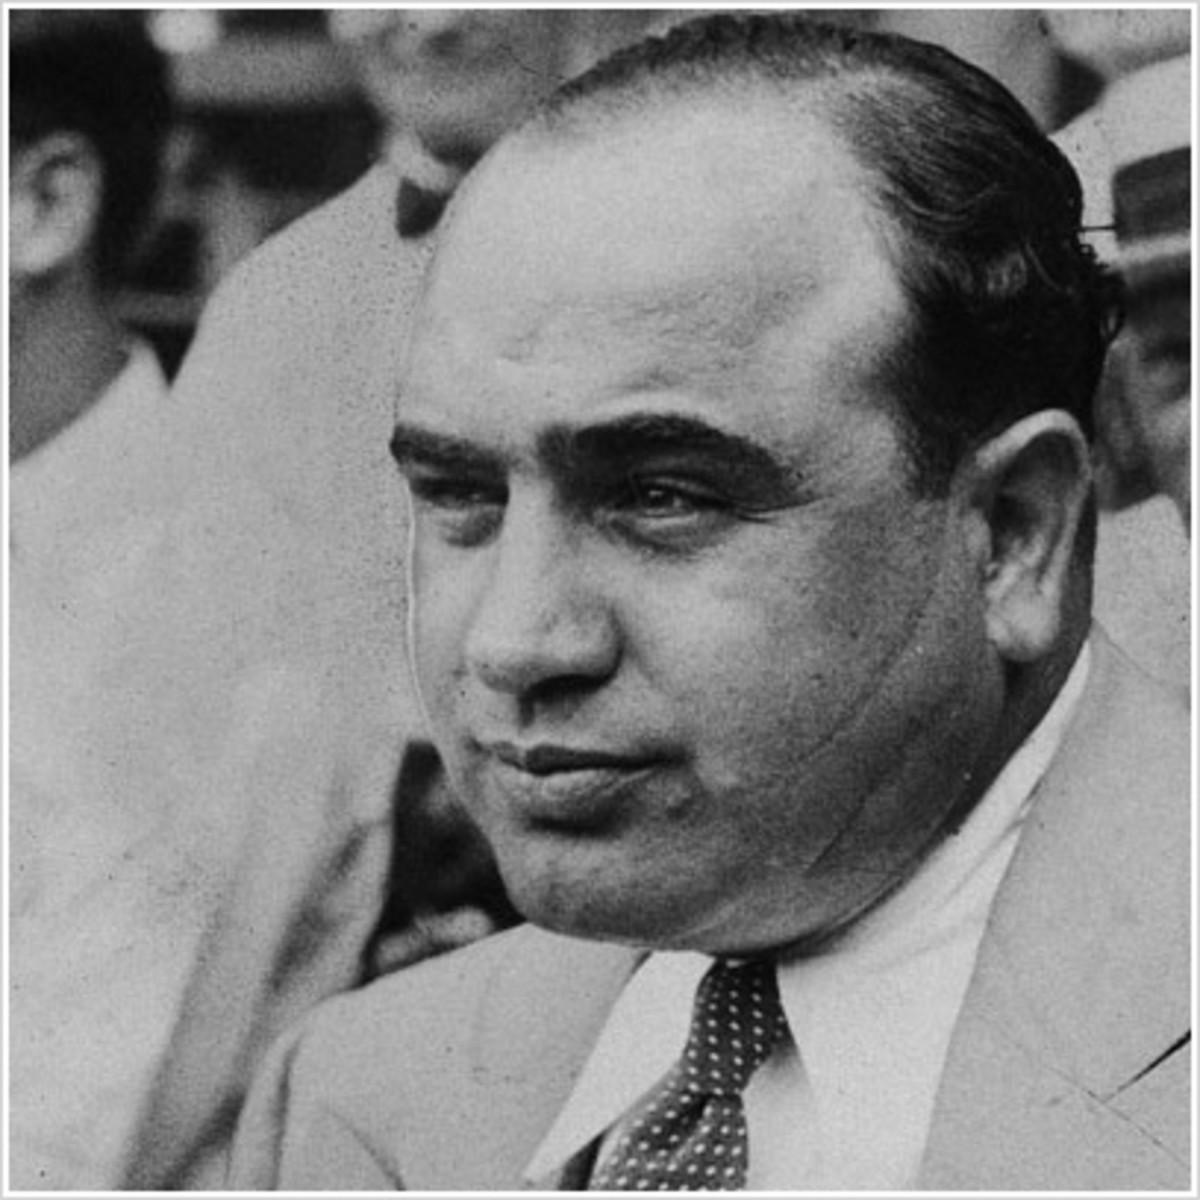 Al Capone (Scareface)